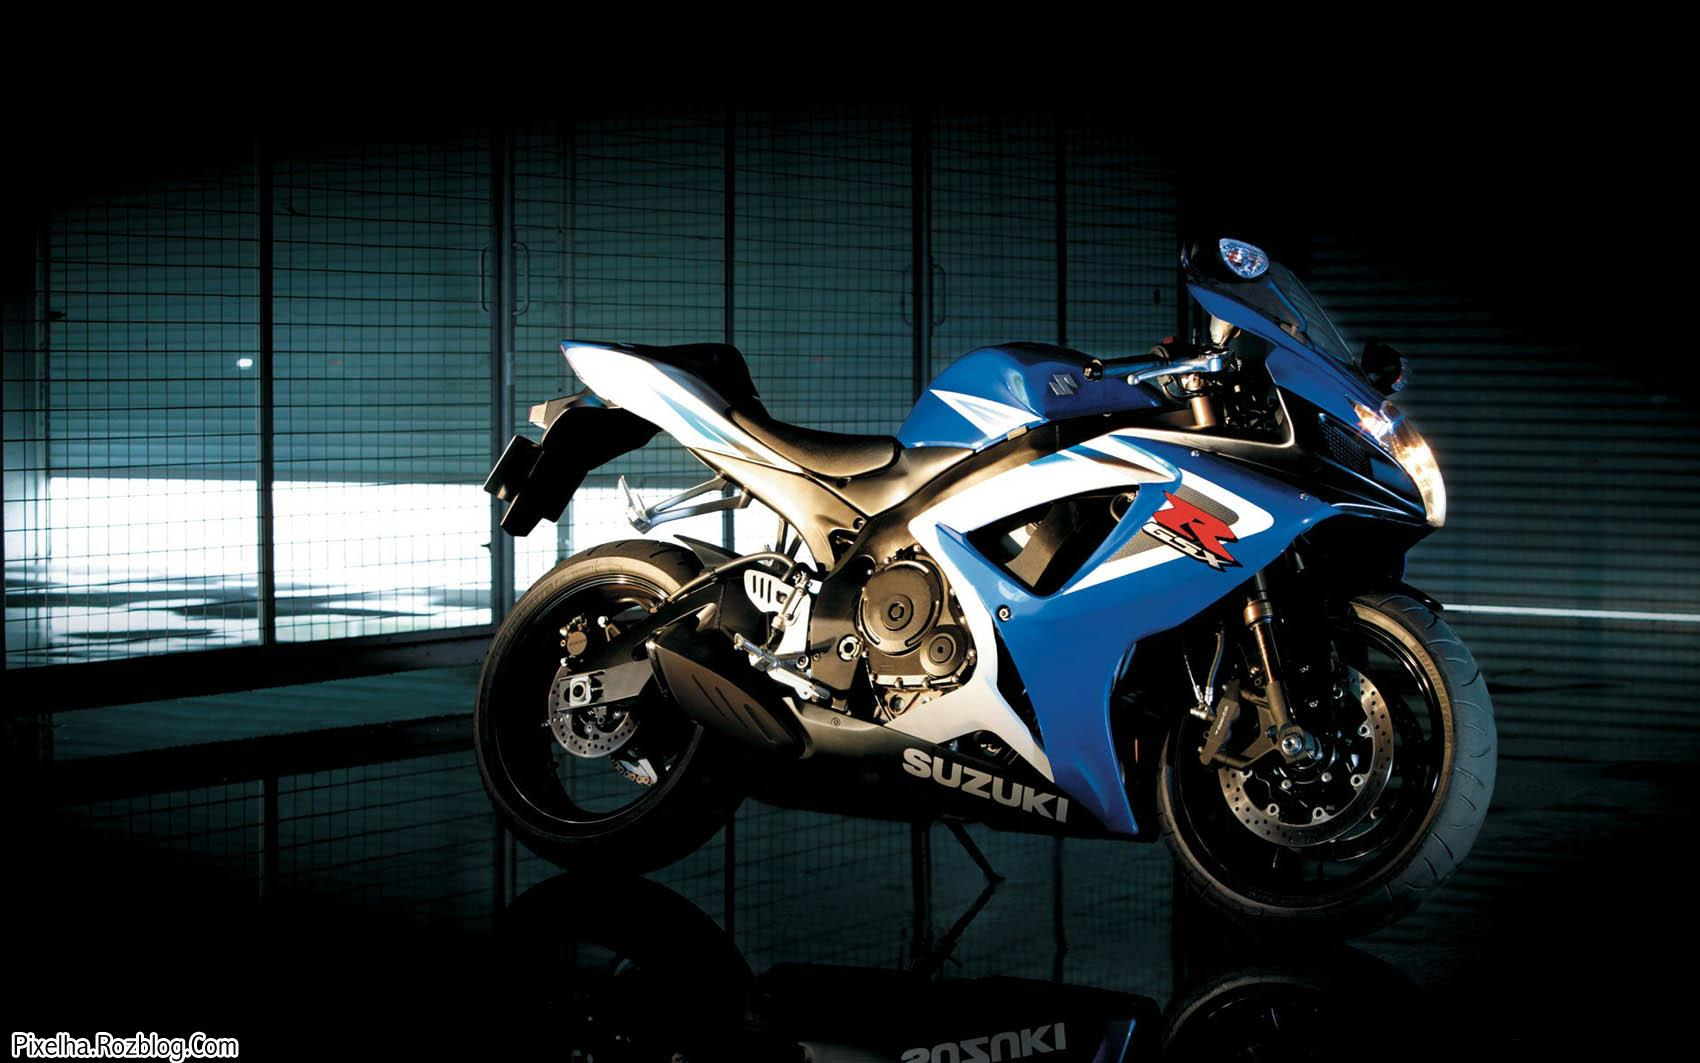 موتور Suzuki gsx r750